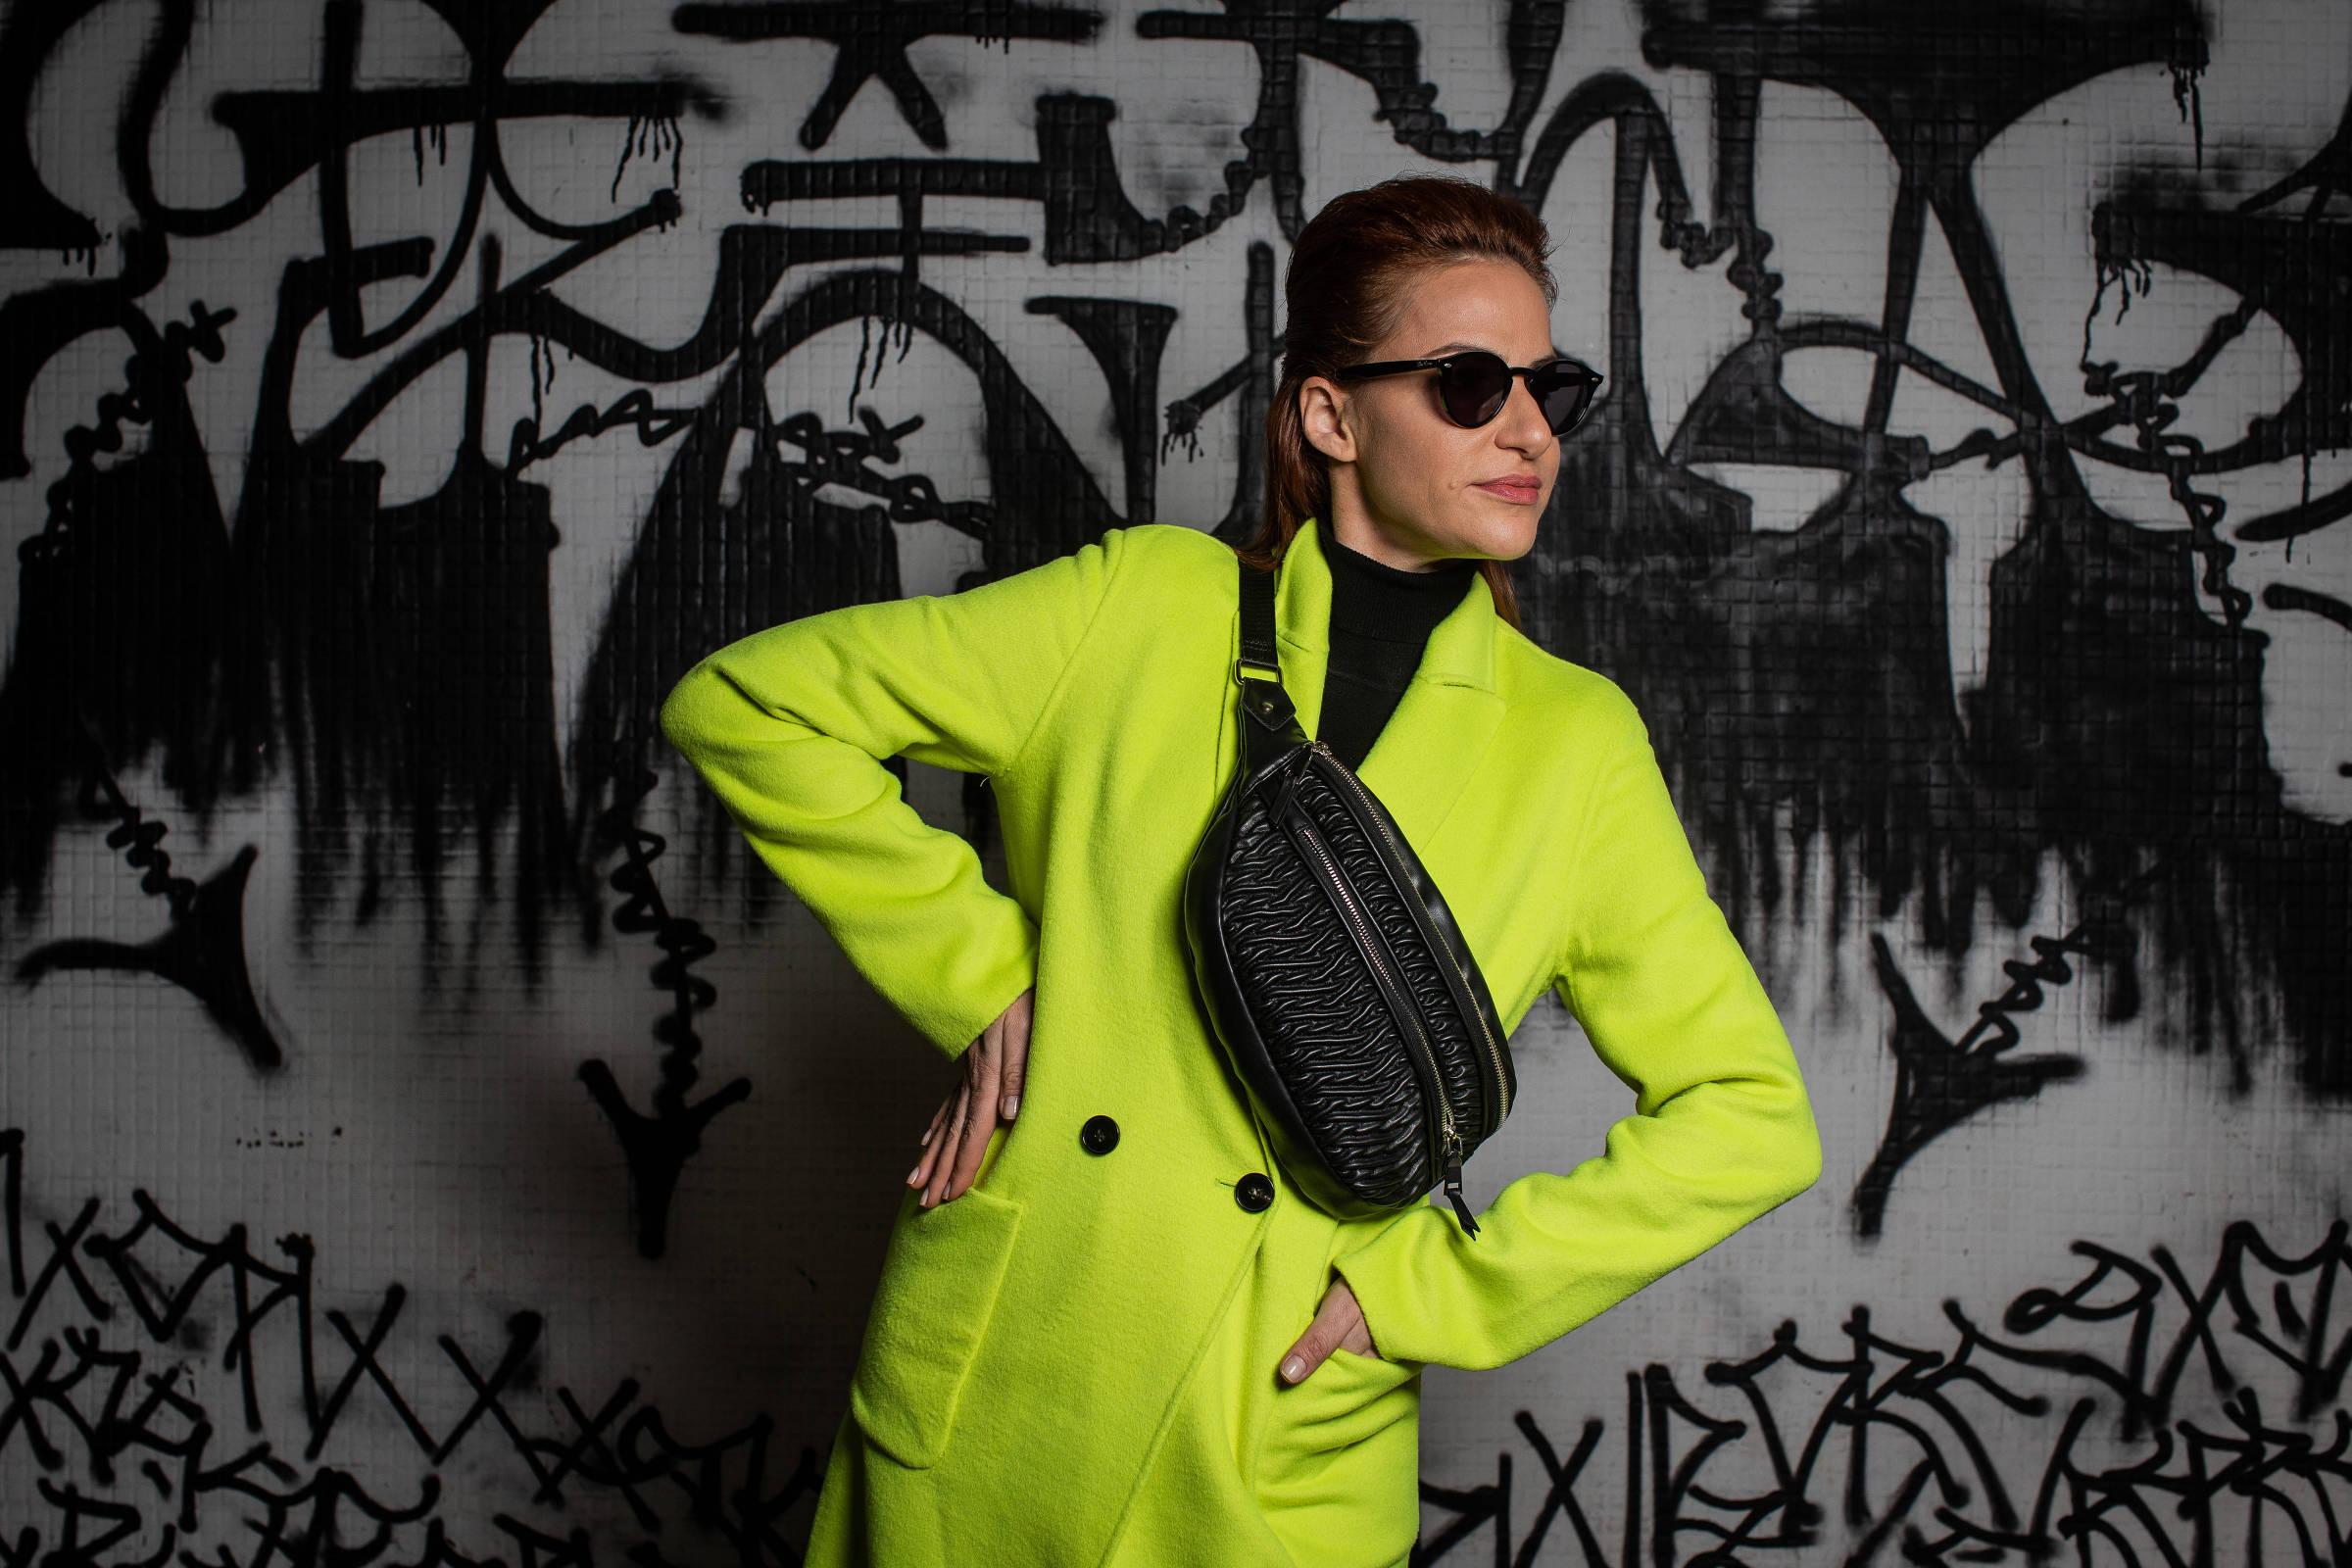 8f10e5d73f F5 - Estilo - Com cores neon e casaco pelúcia